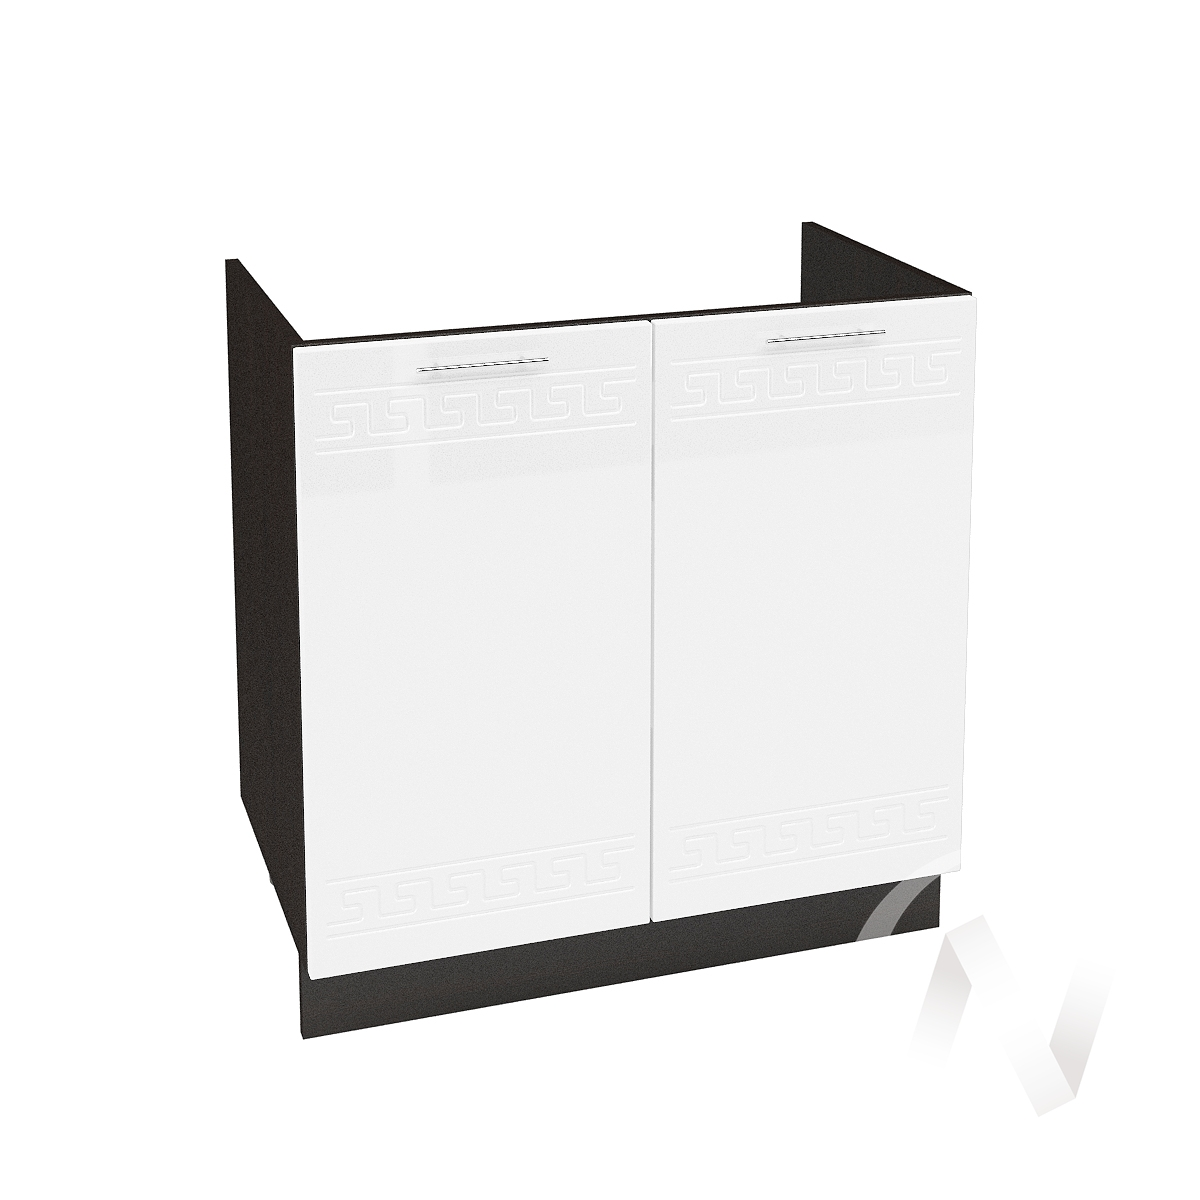 "Кухня ""Греция"": Шкаф нижний под мойку 800, ШНМ 800 (белый металлик/корпус венге)"